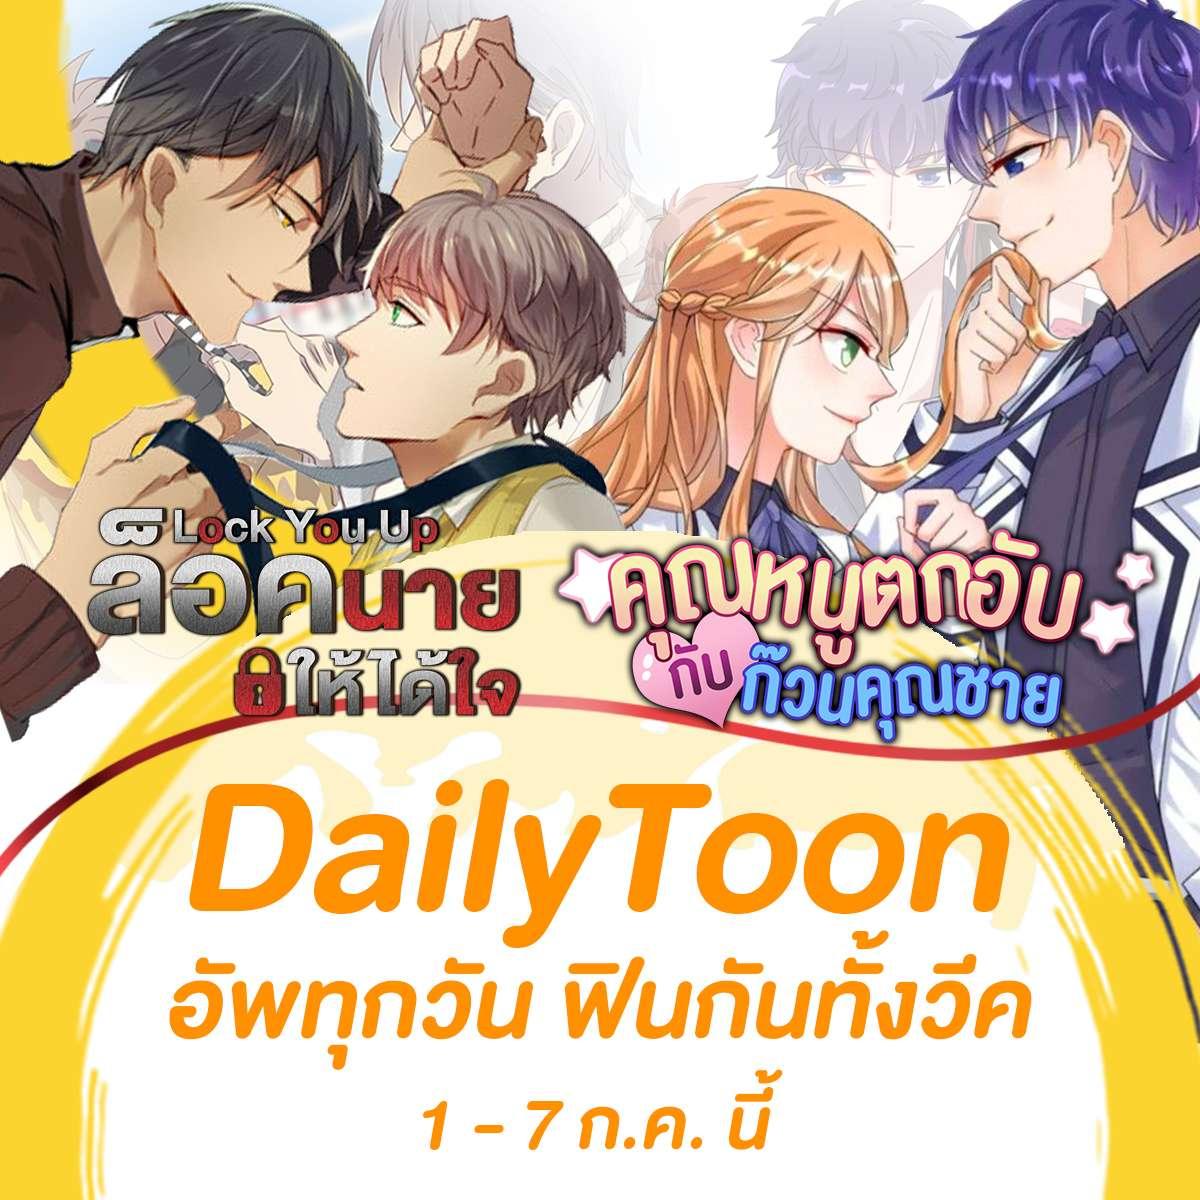 ANM_Daily Toon อัพทุกวัน มันส์ทุกตอน